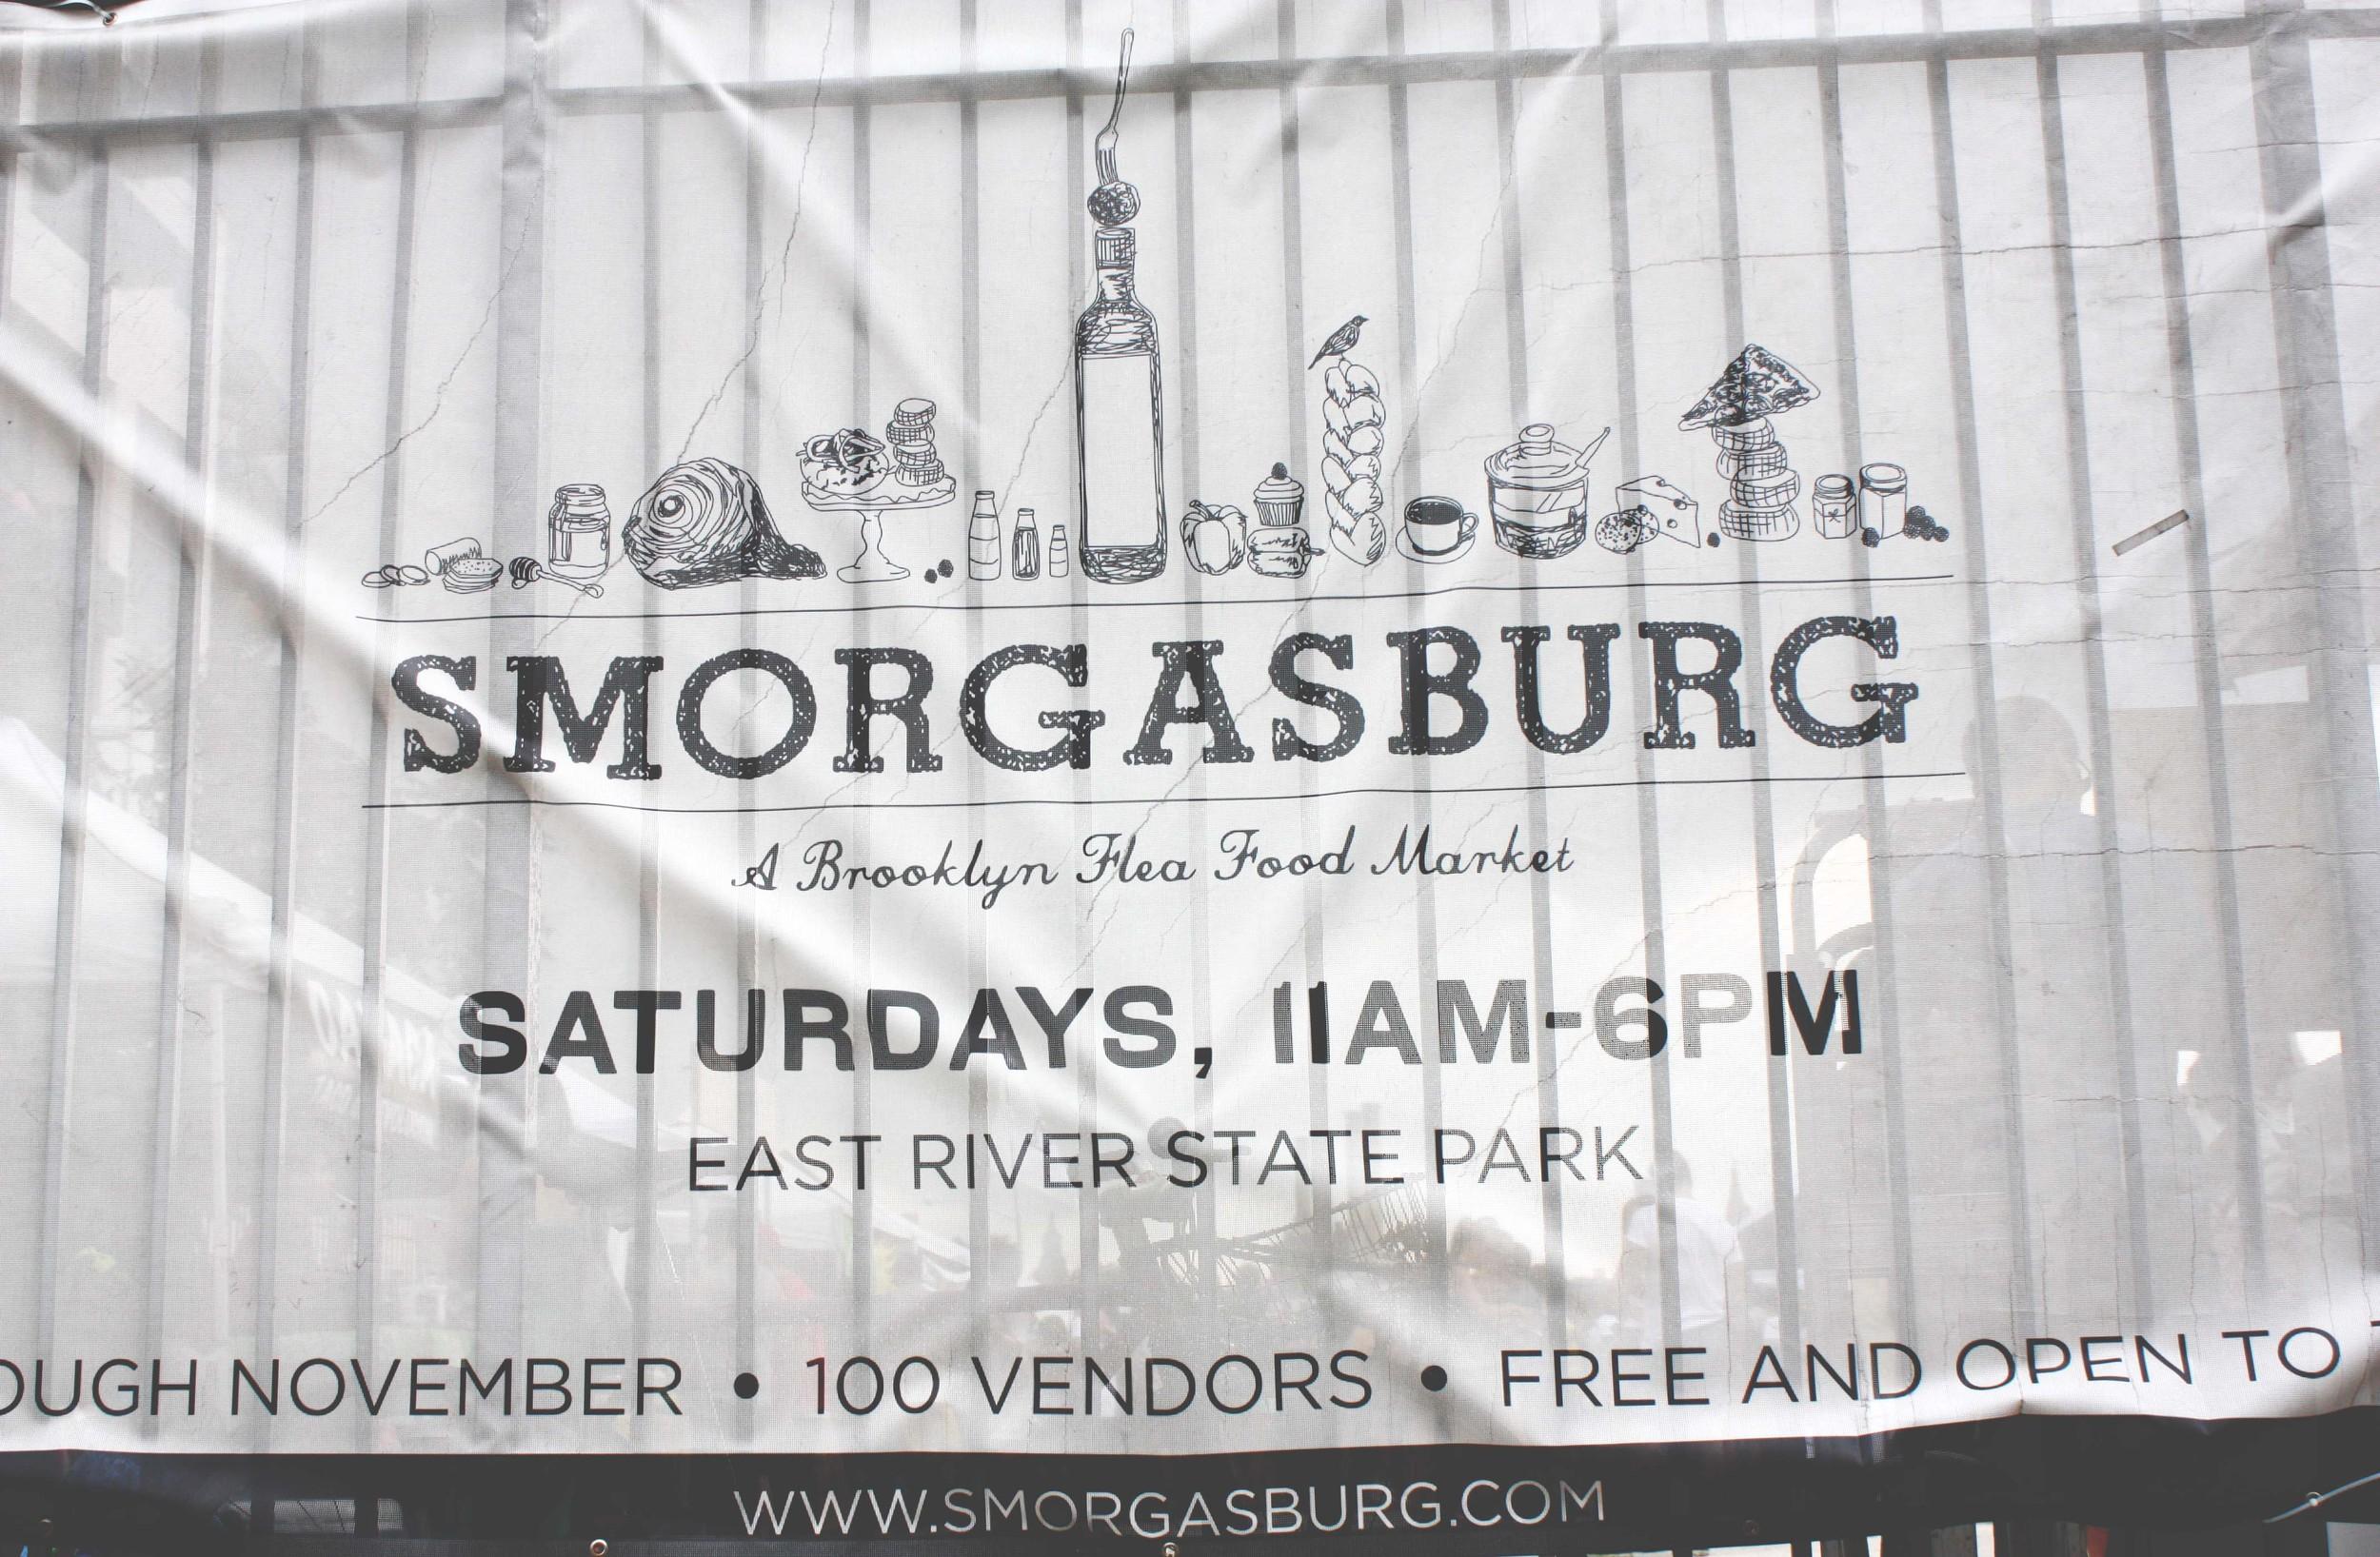 smorgasburg-sign.jpg